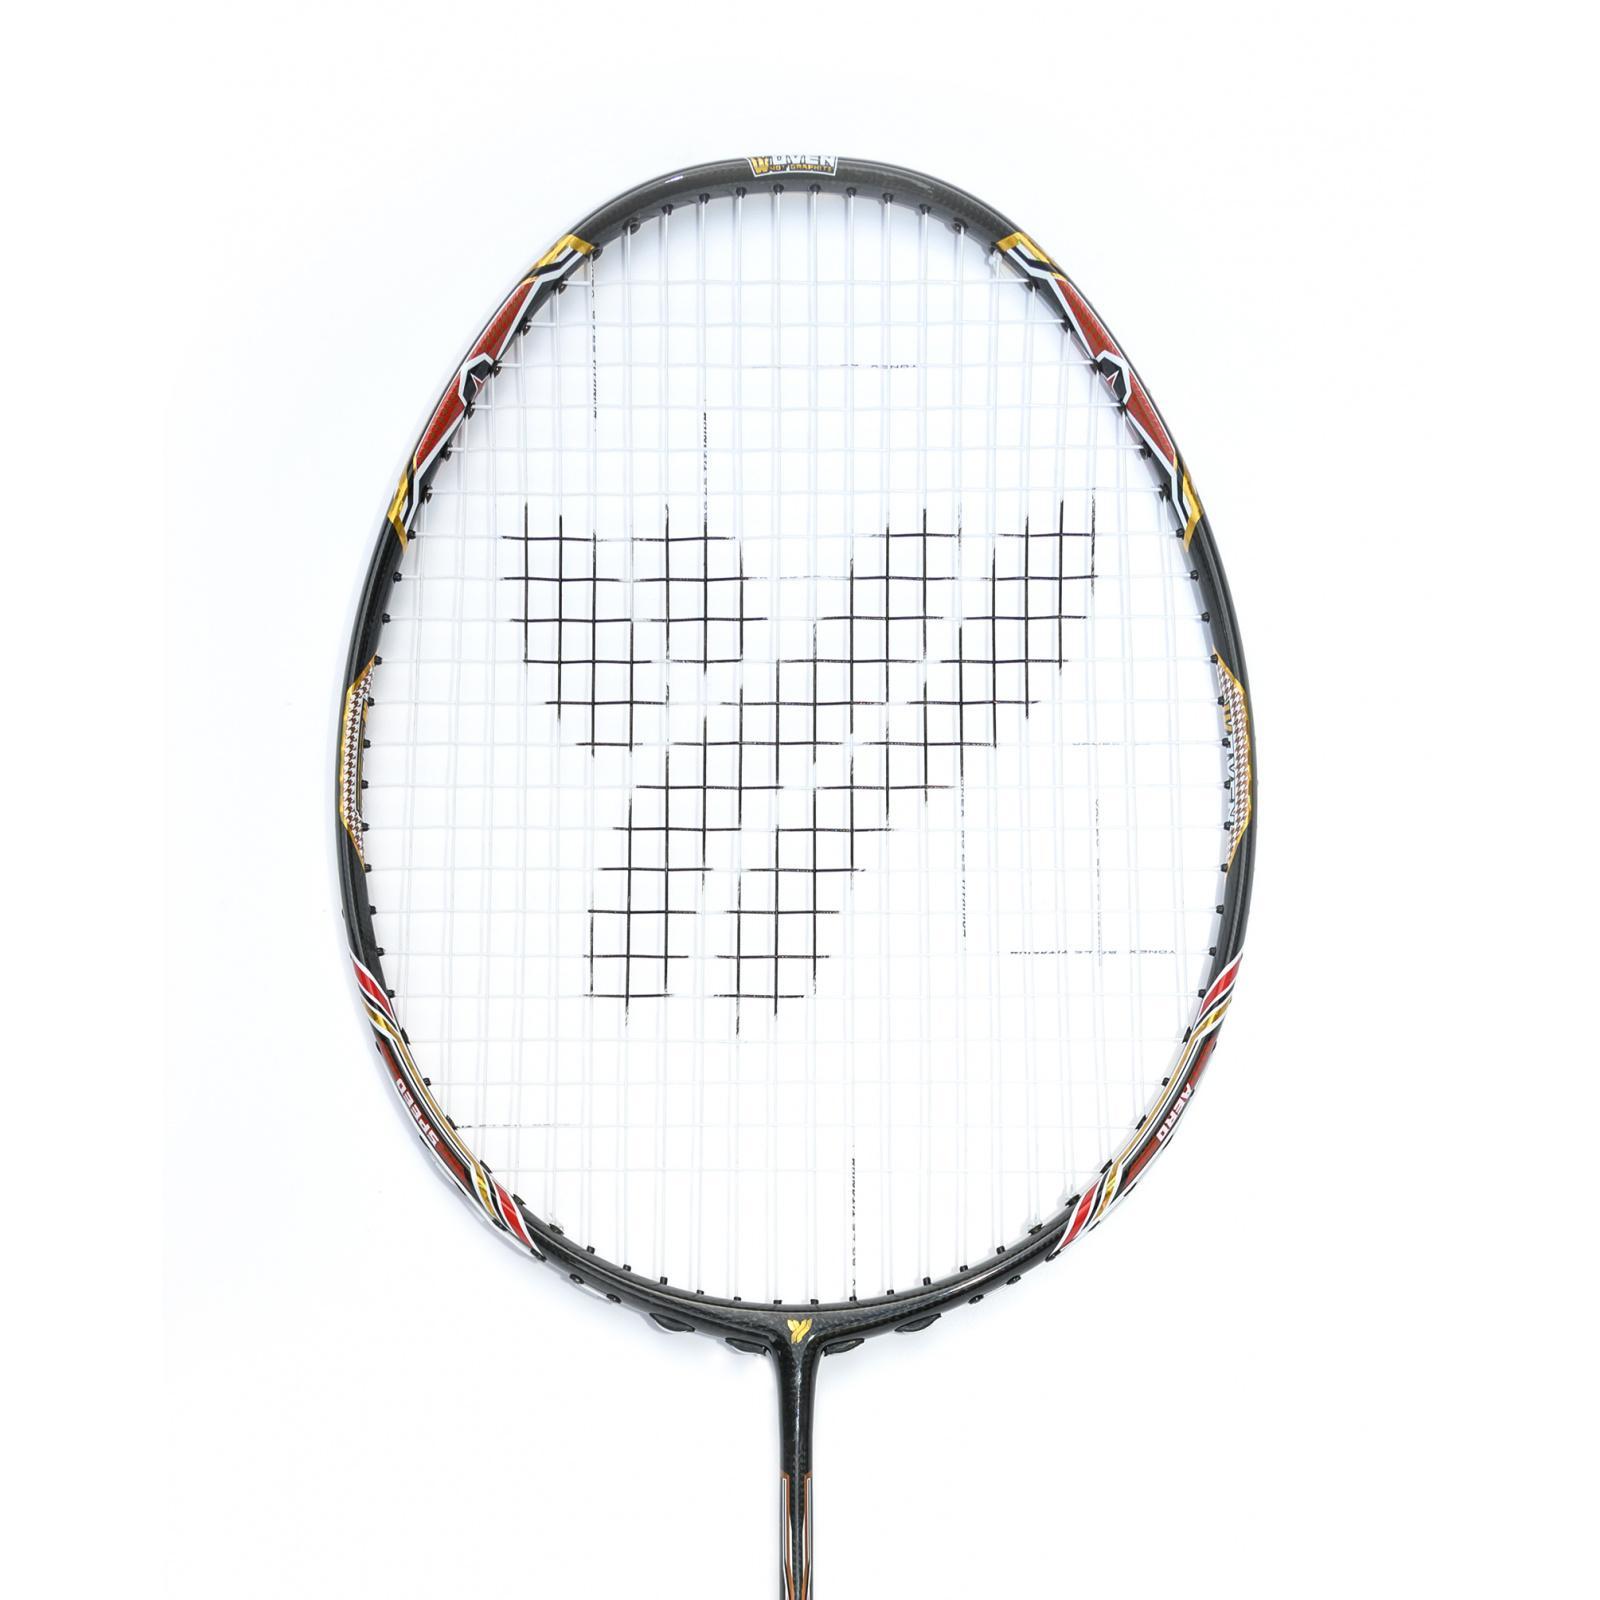 https://www.badec.store/produkty_img/badmintonova-raketa1569326790L.jpg